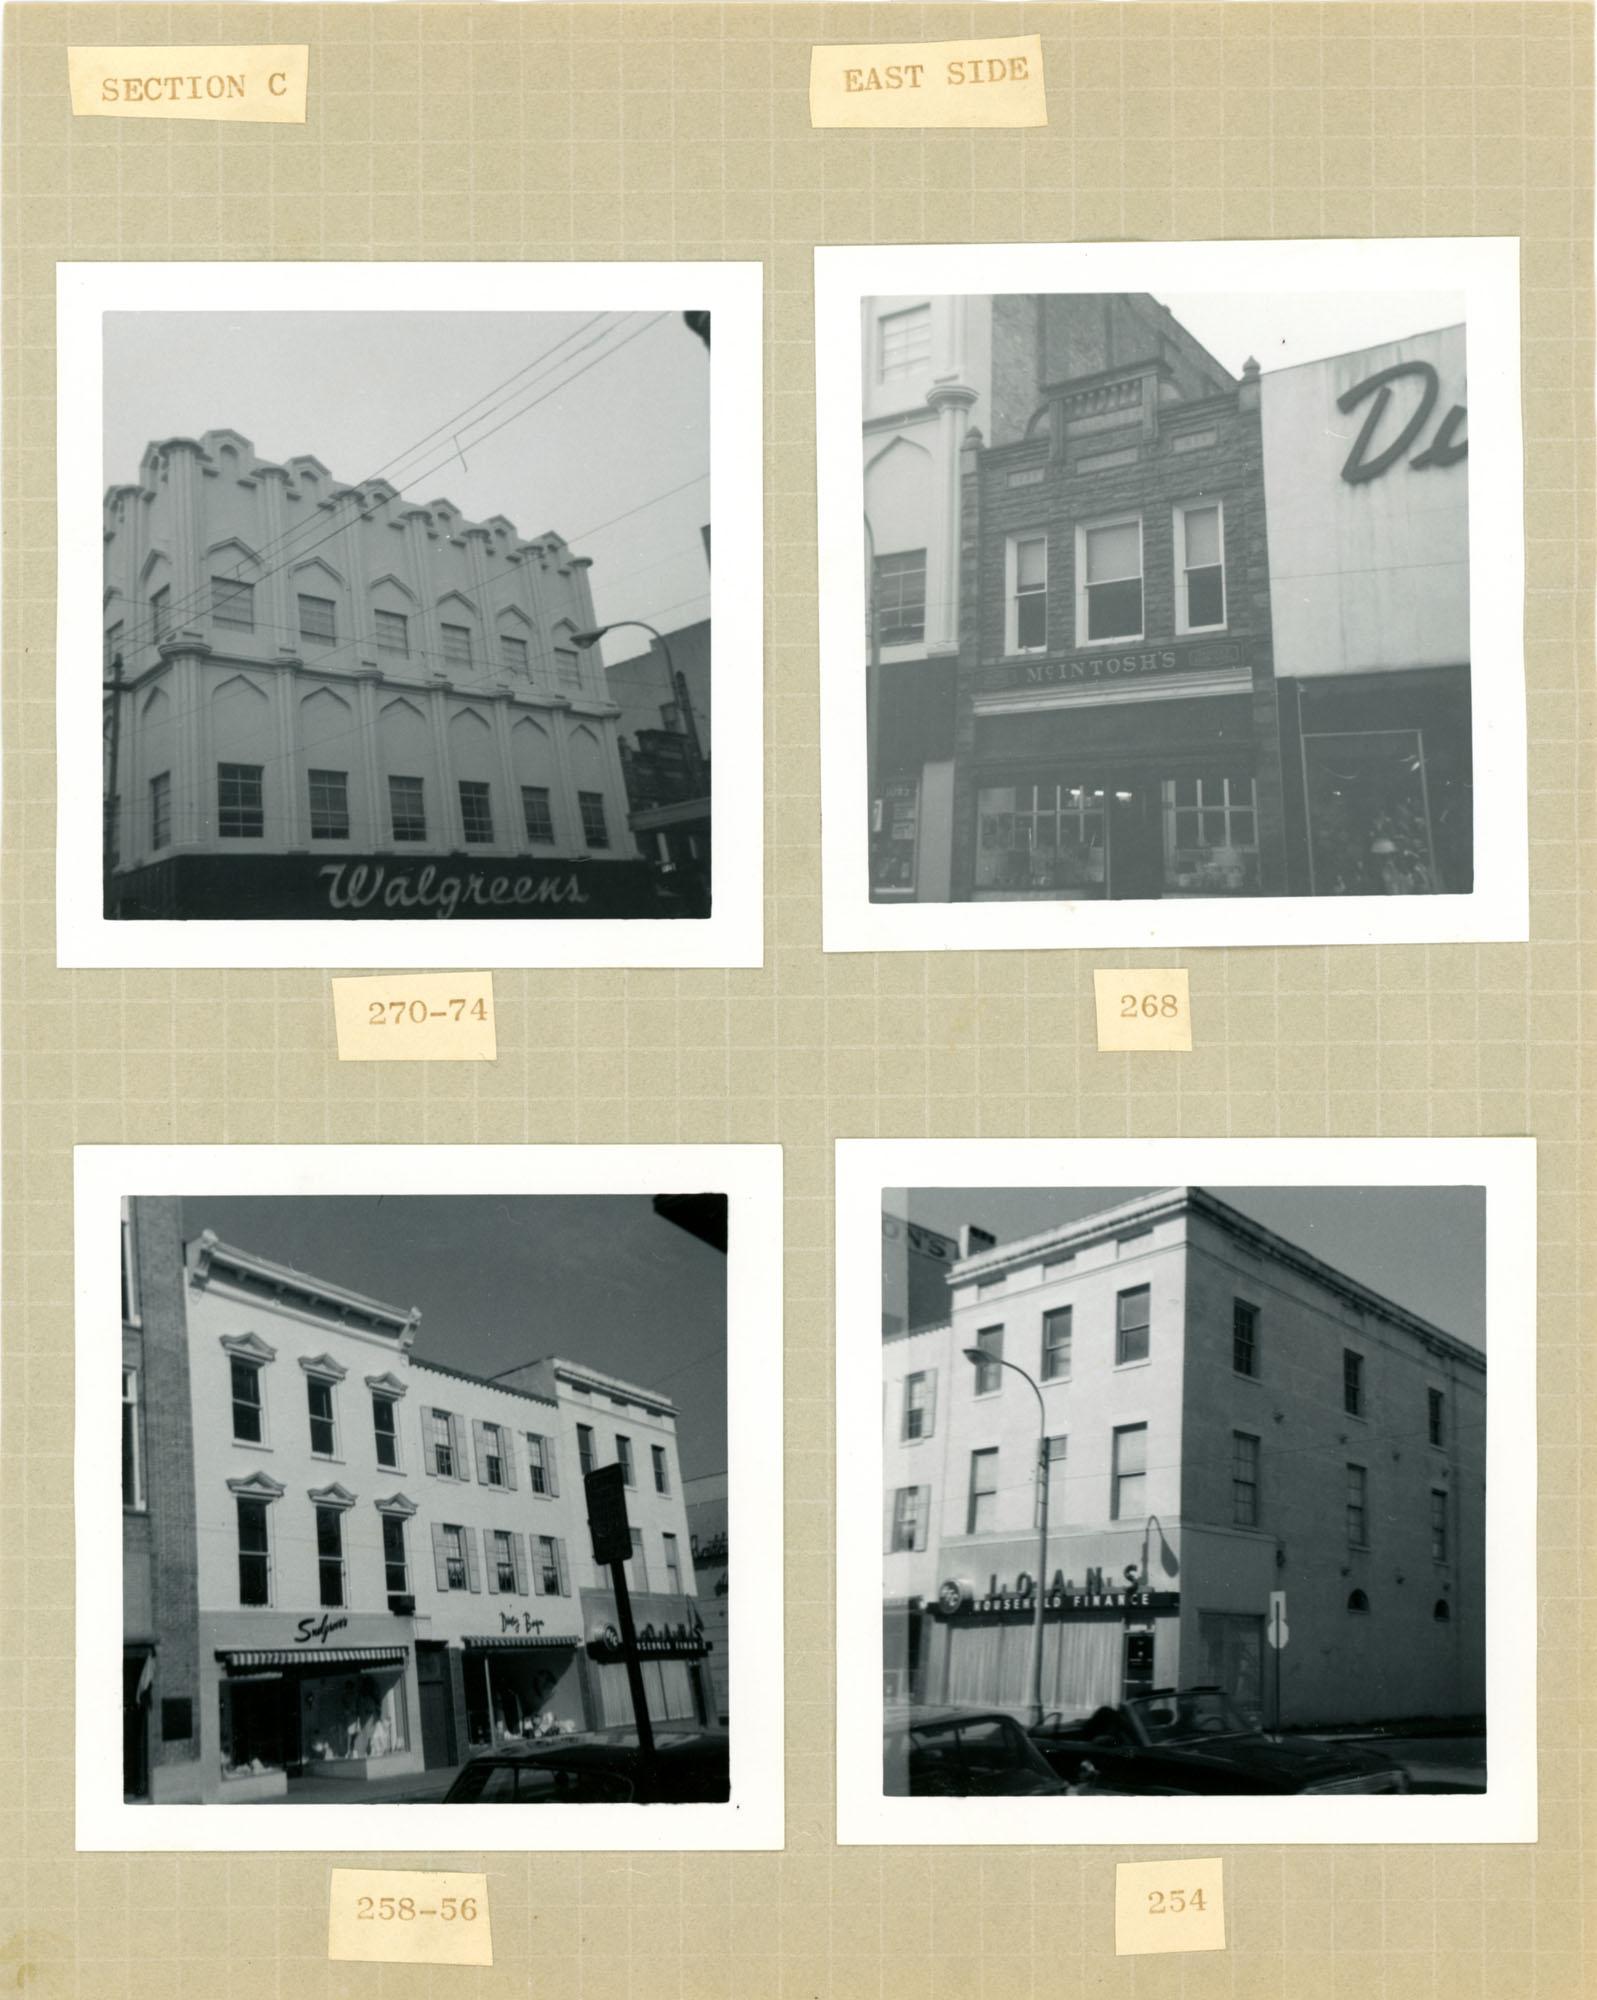 King Street Survey Photo Album, Page 7 (back): 254-274 King Street